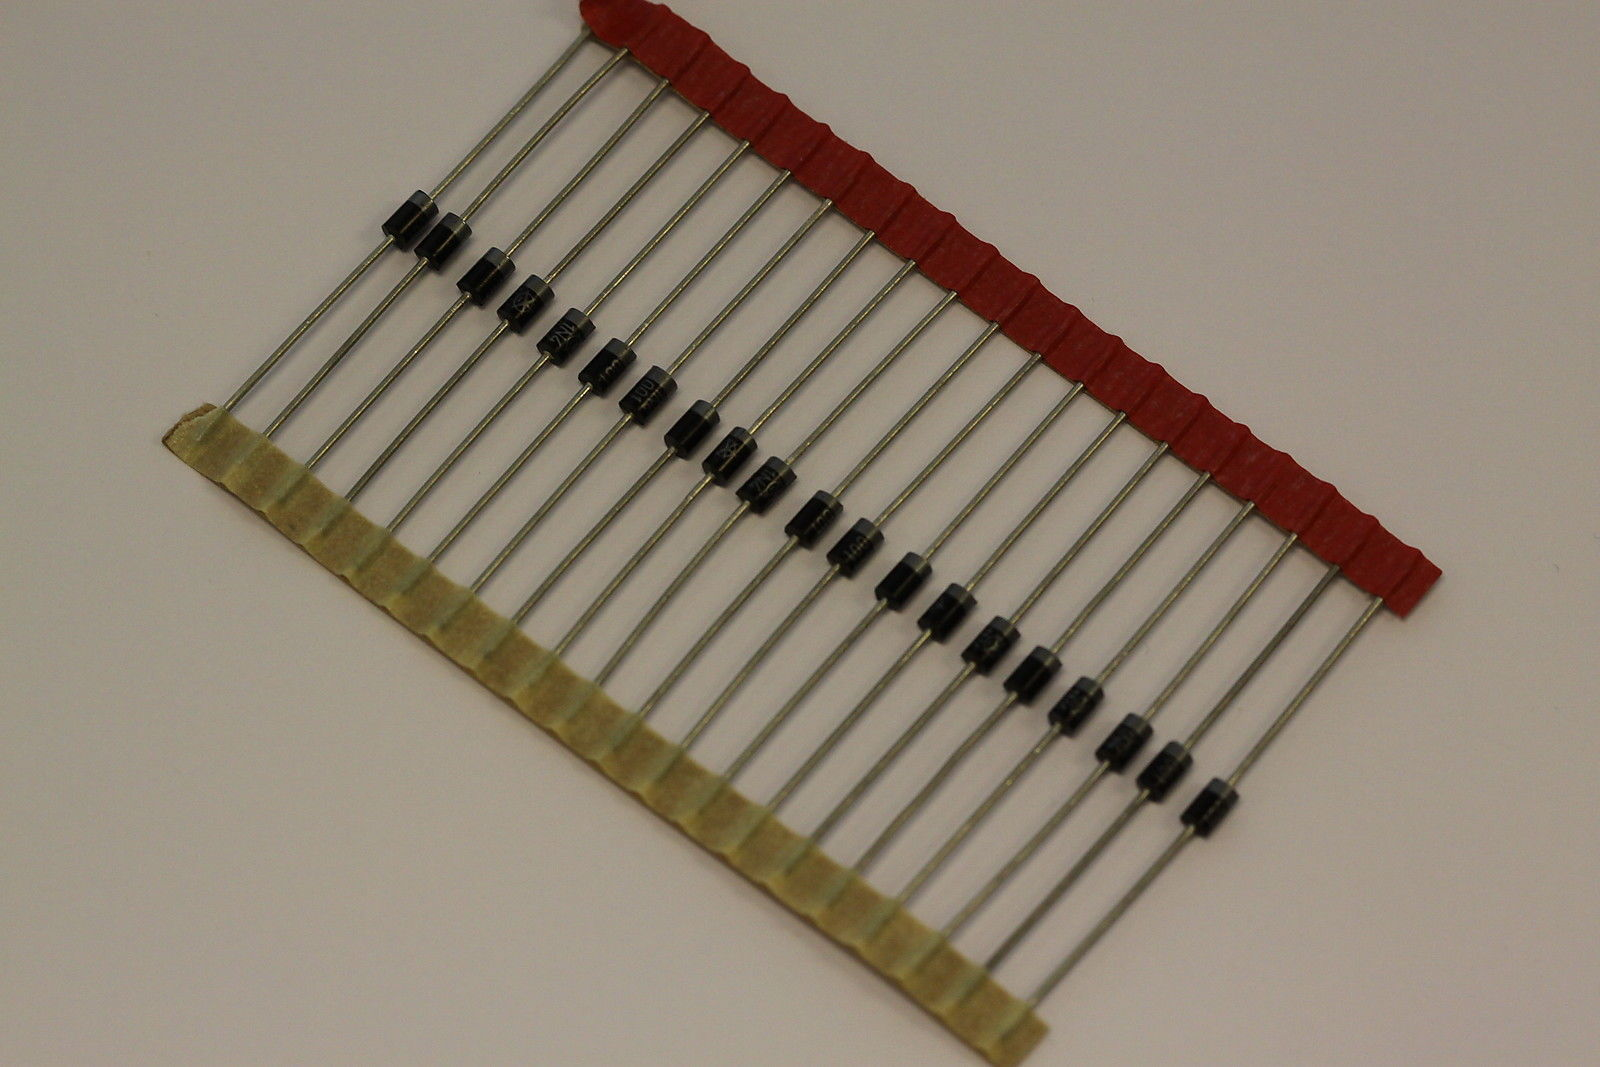 A Diode Protect Cmos Circuit